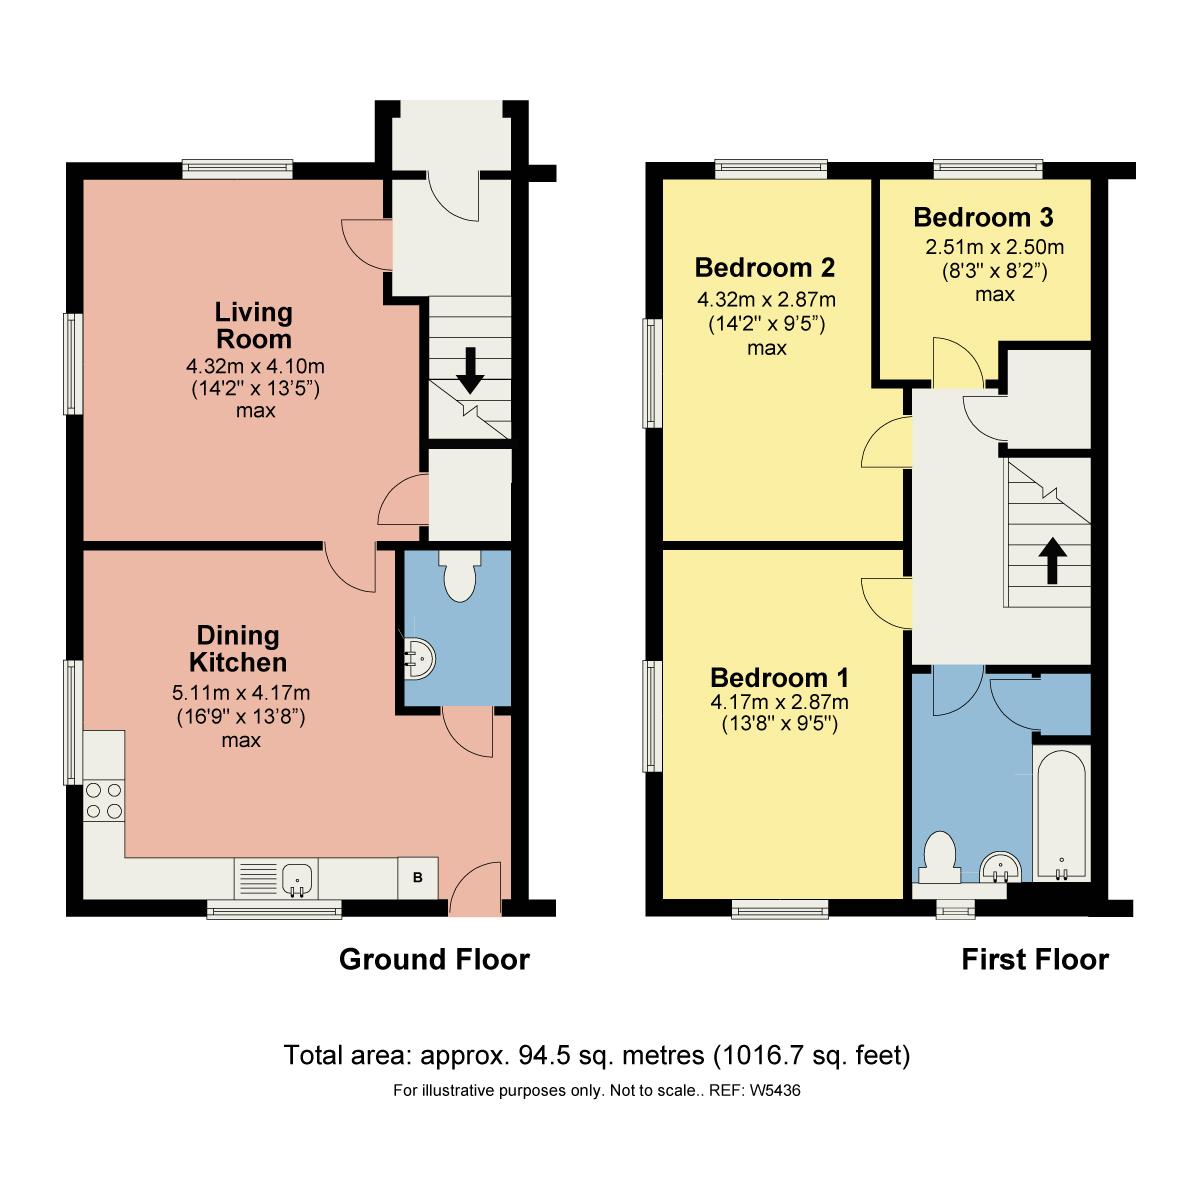 Floorplan 24 Crookfield (Plot 5), Crook Road, Staveley, Kendal, Cumbria, LA8 9QS